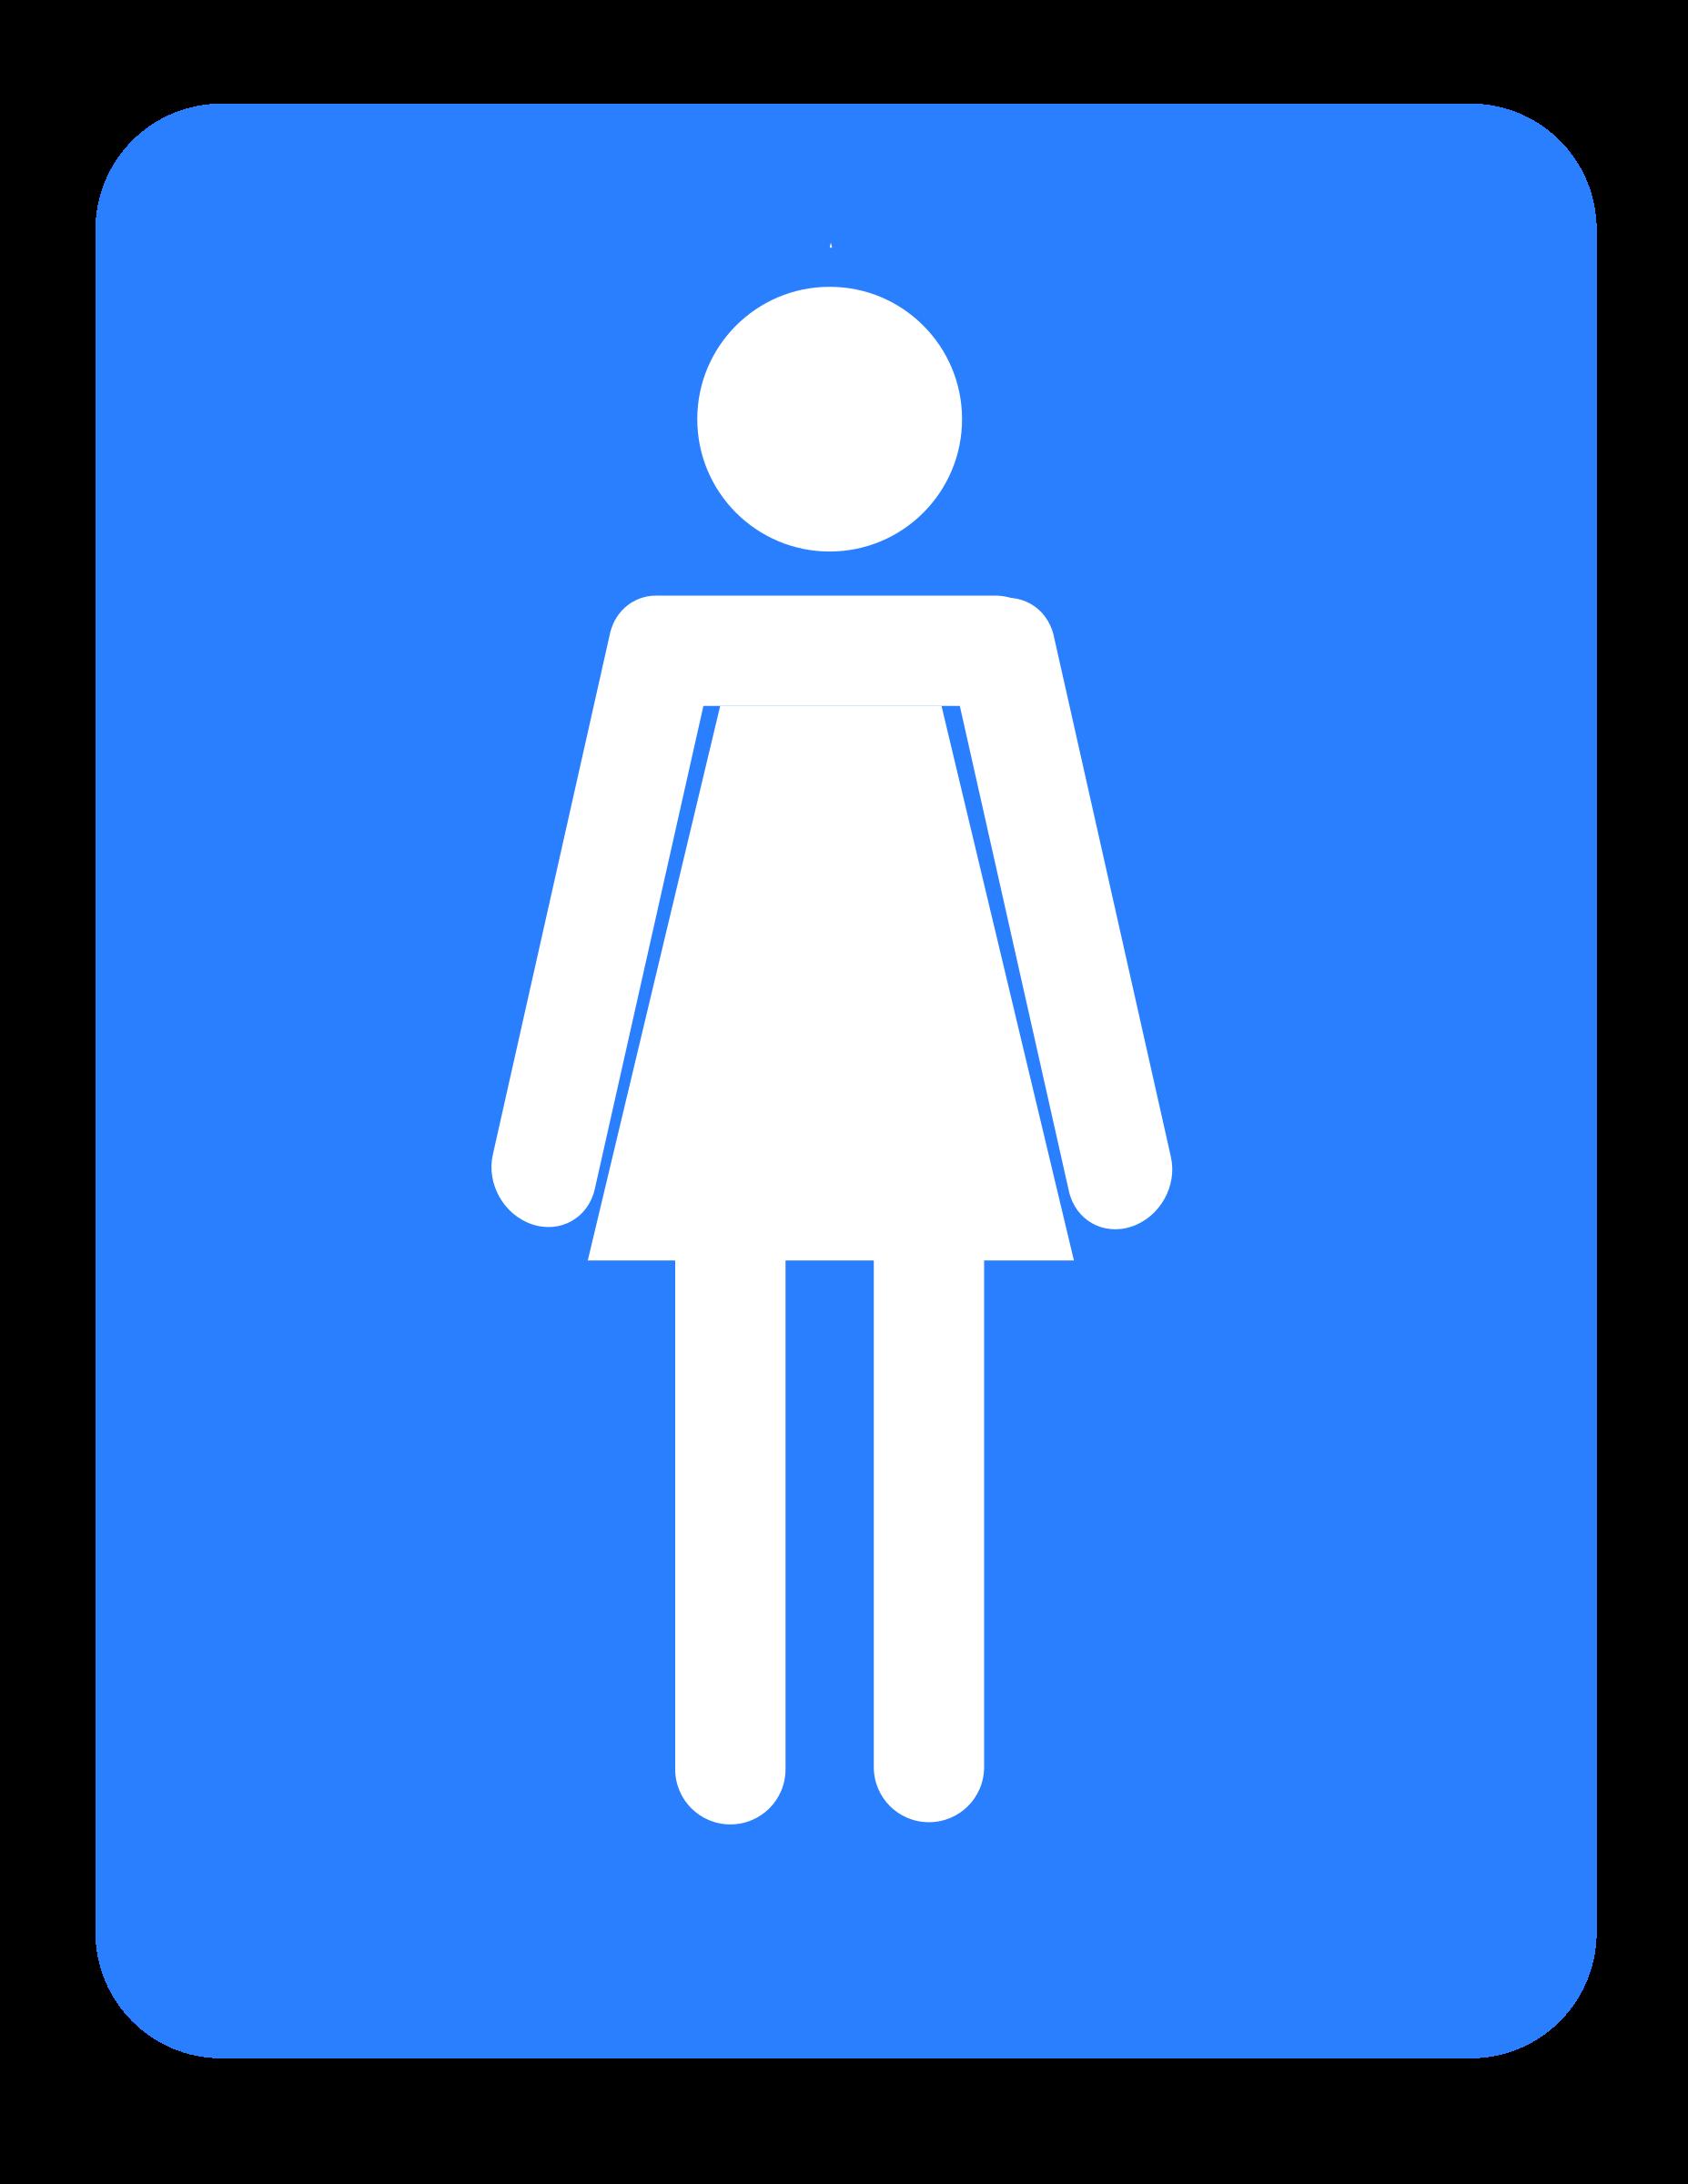 Women big image png. Lady clipart bathroom